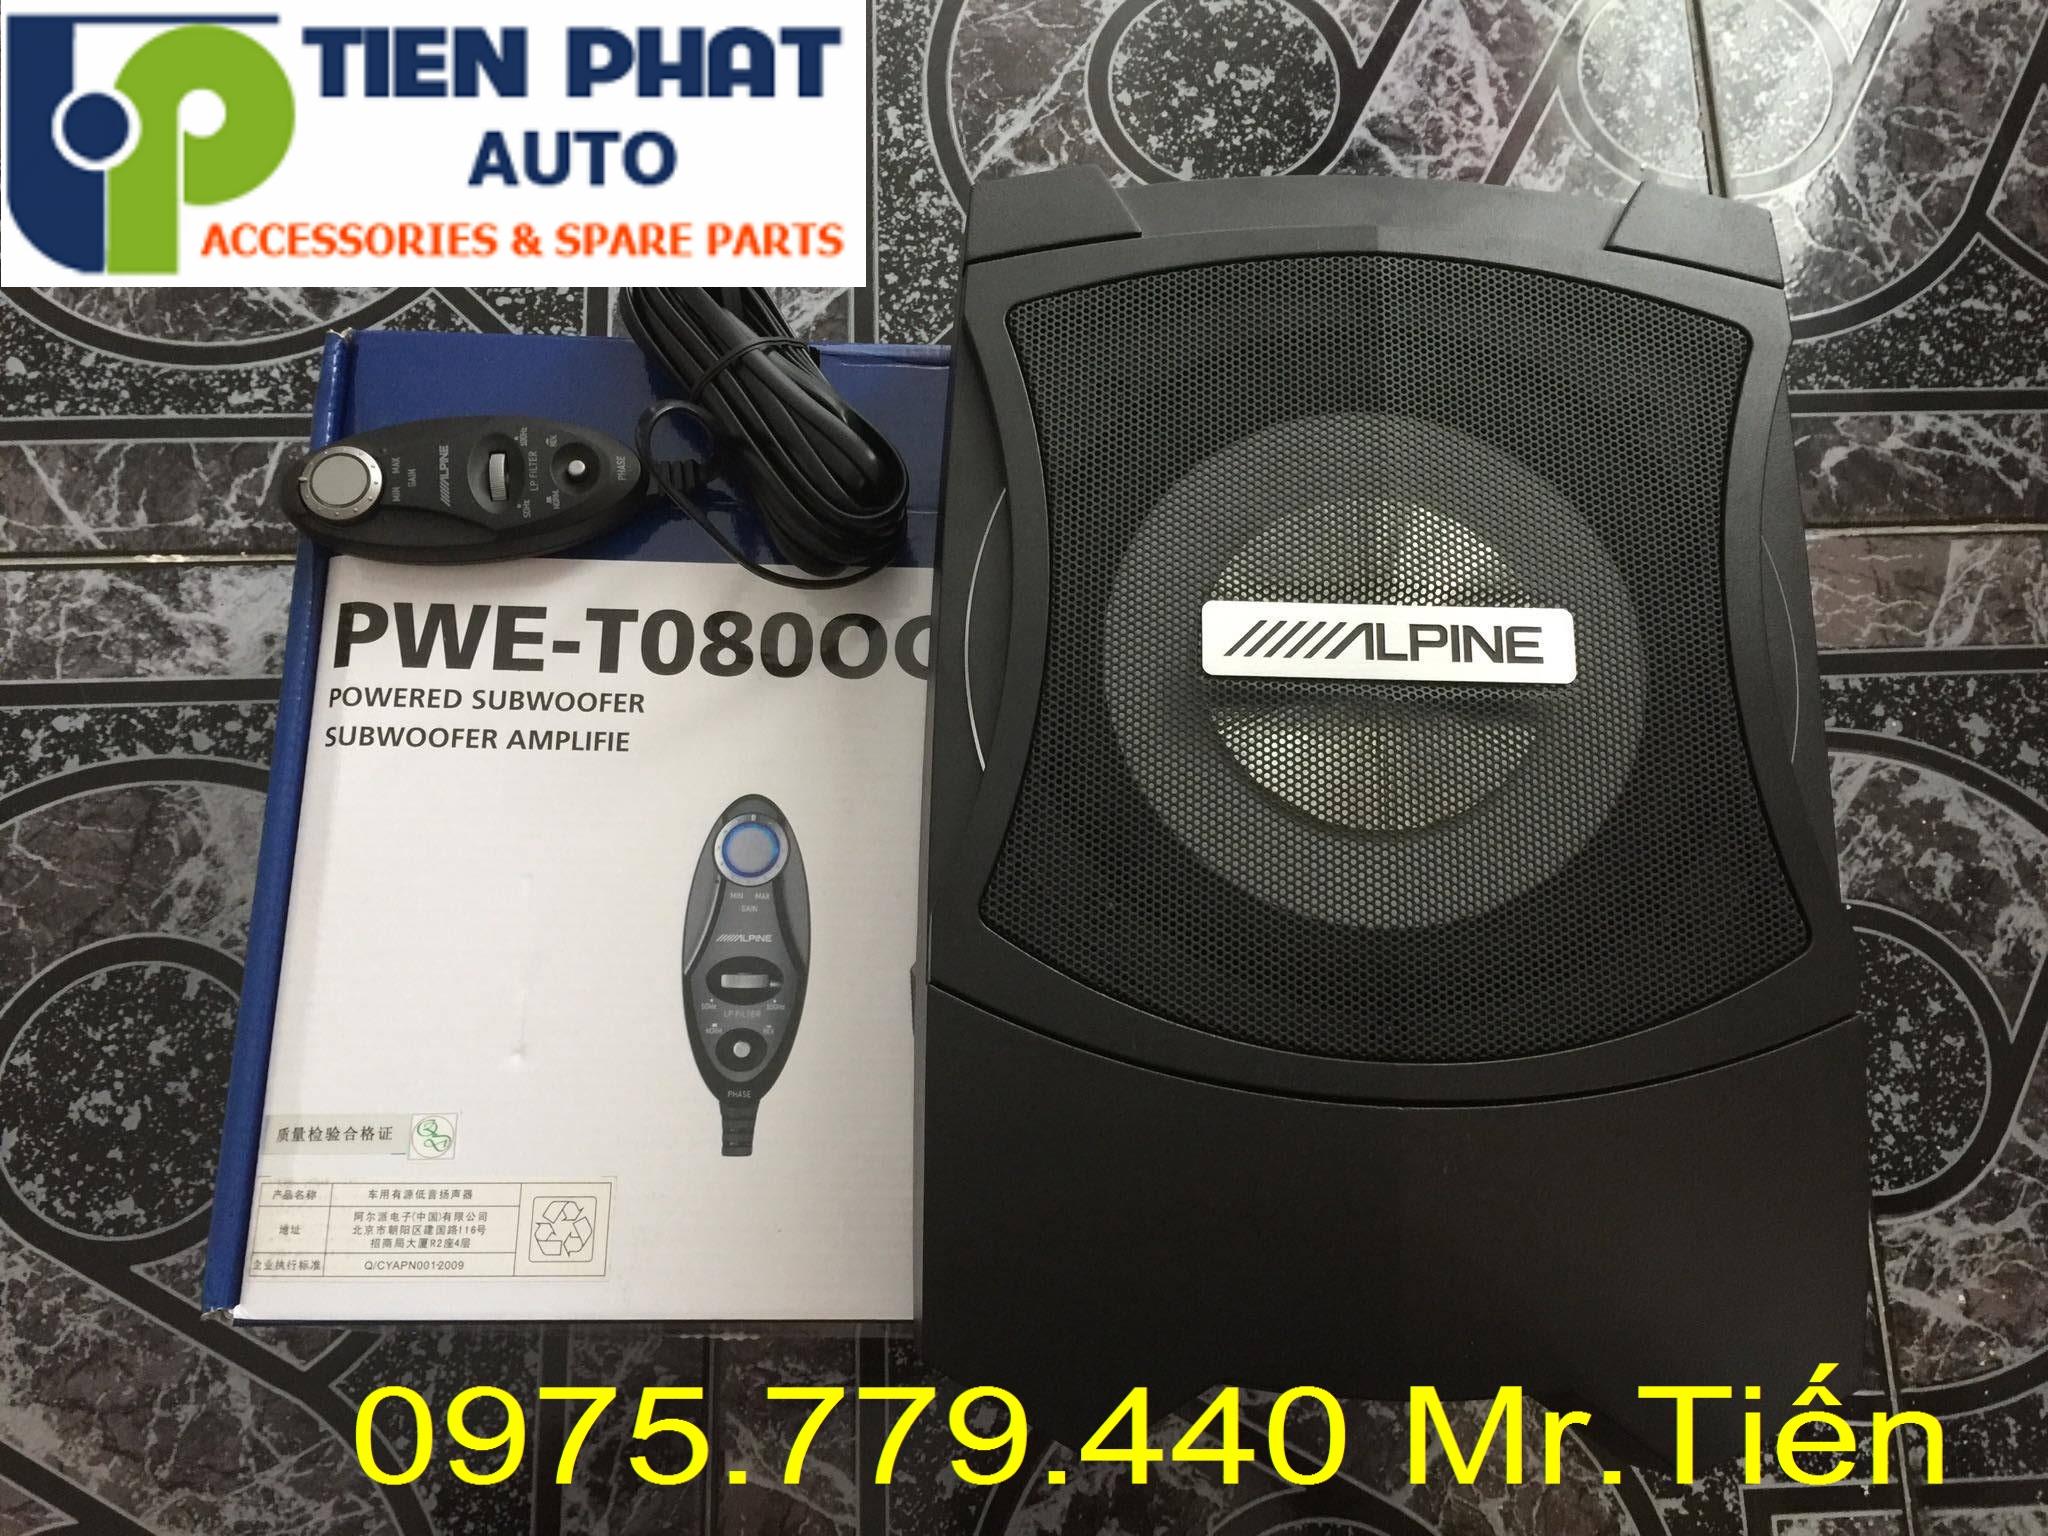 Lắp Loa sub Alpine PWE-T0800C cho Toyota Fortuner Lắp Đặt Tận Nơi